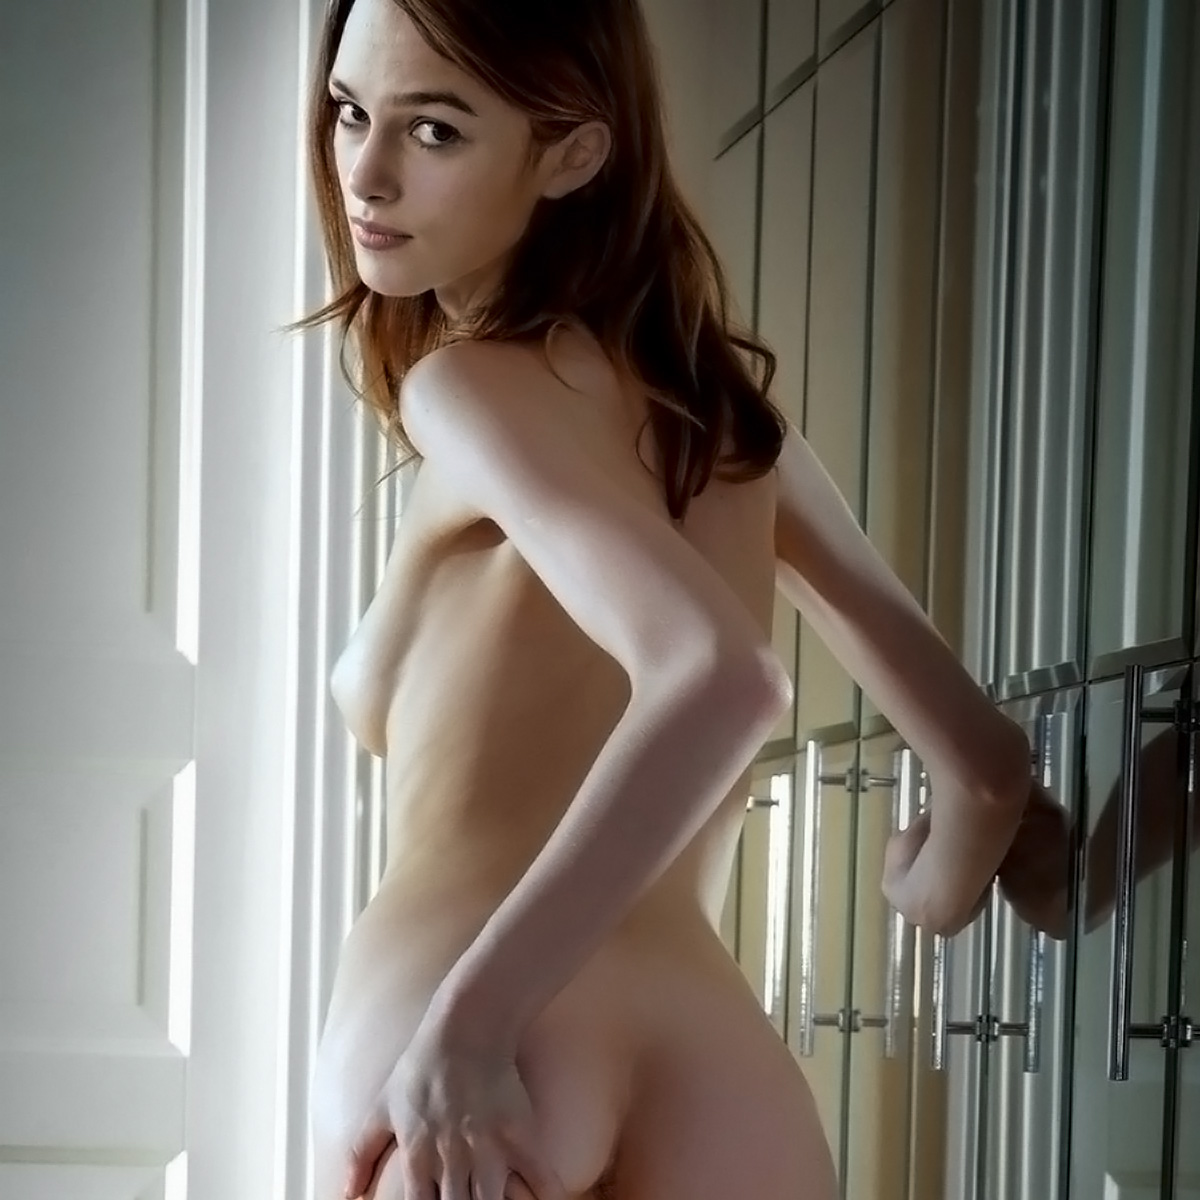 naked-pussy-keira-knightley-cutegirlsexphoto